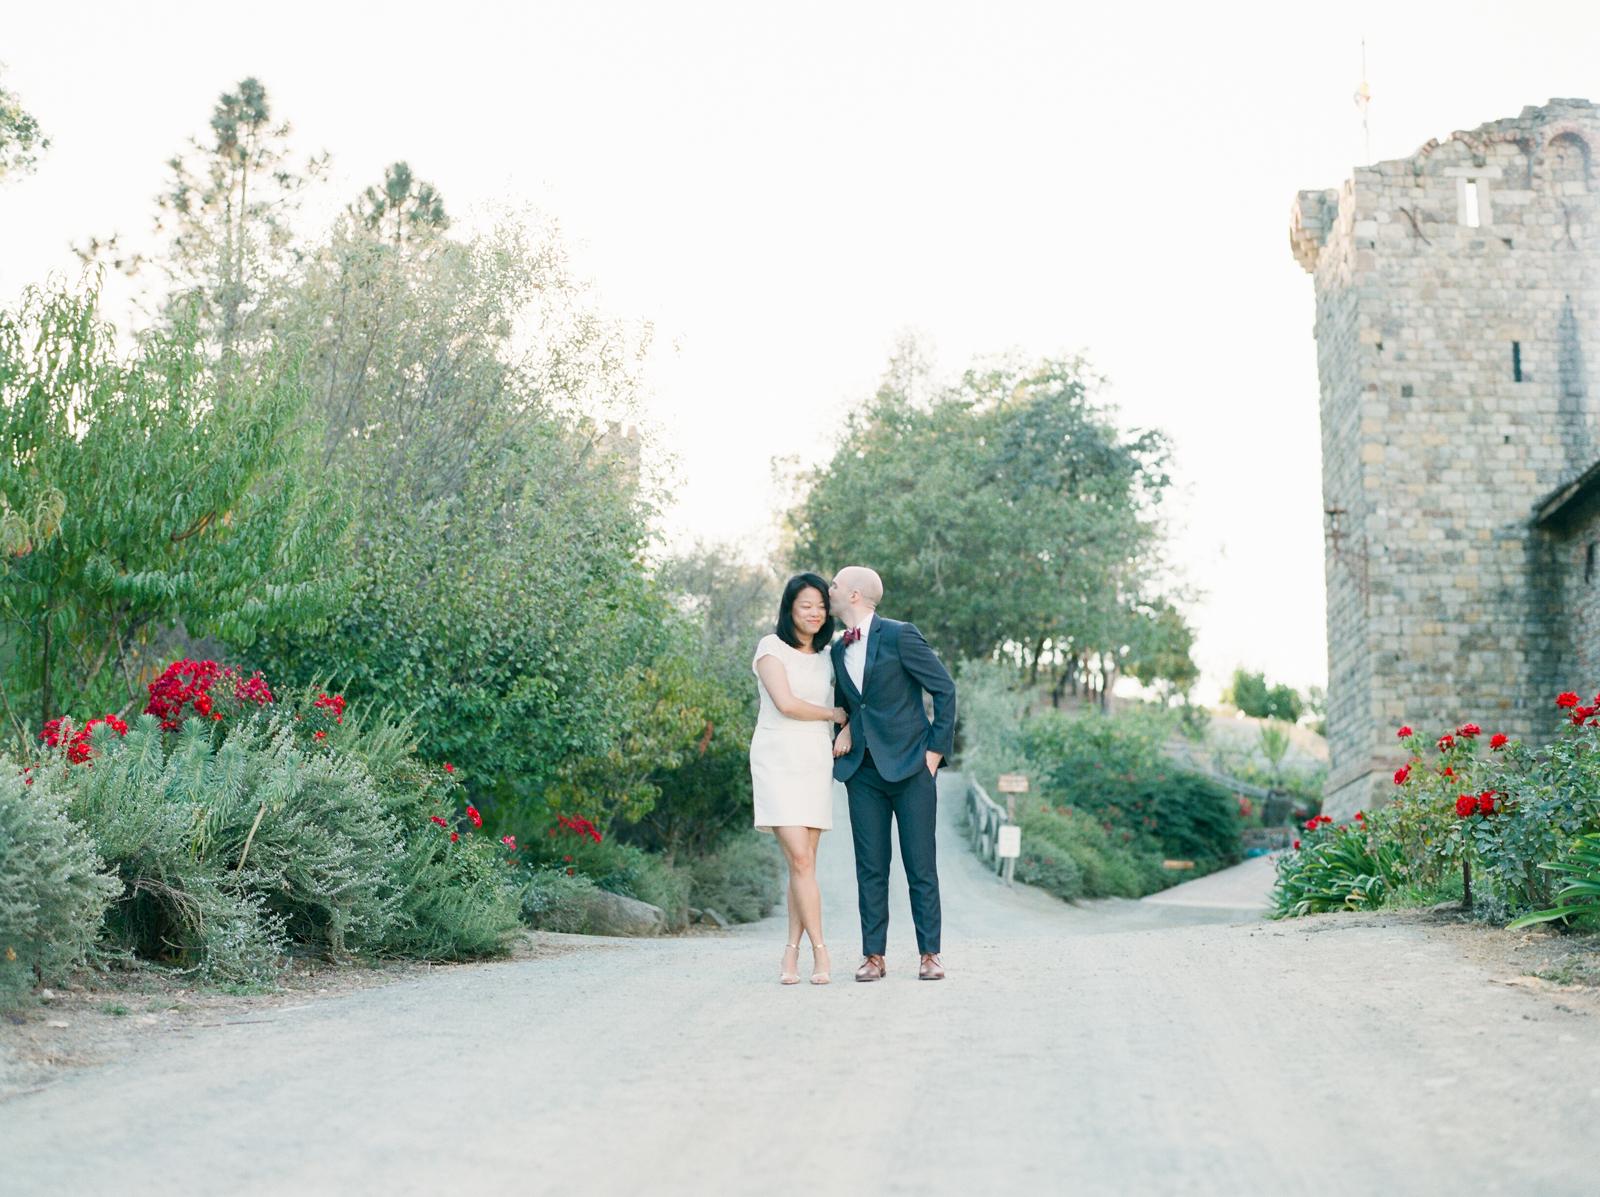 Napa Valley Engagement Session - Fine Art Photographer